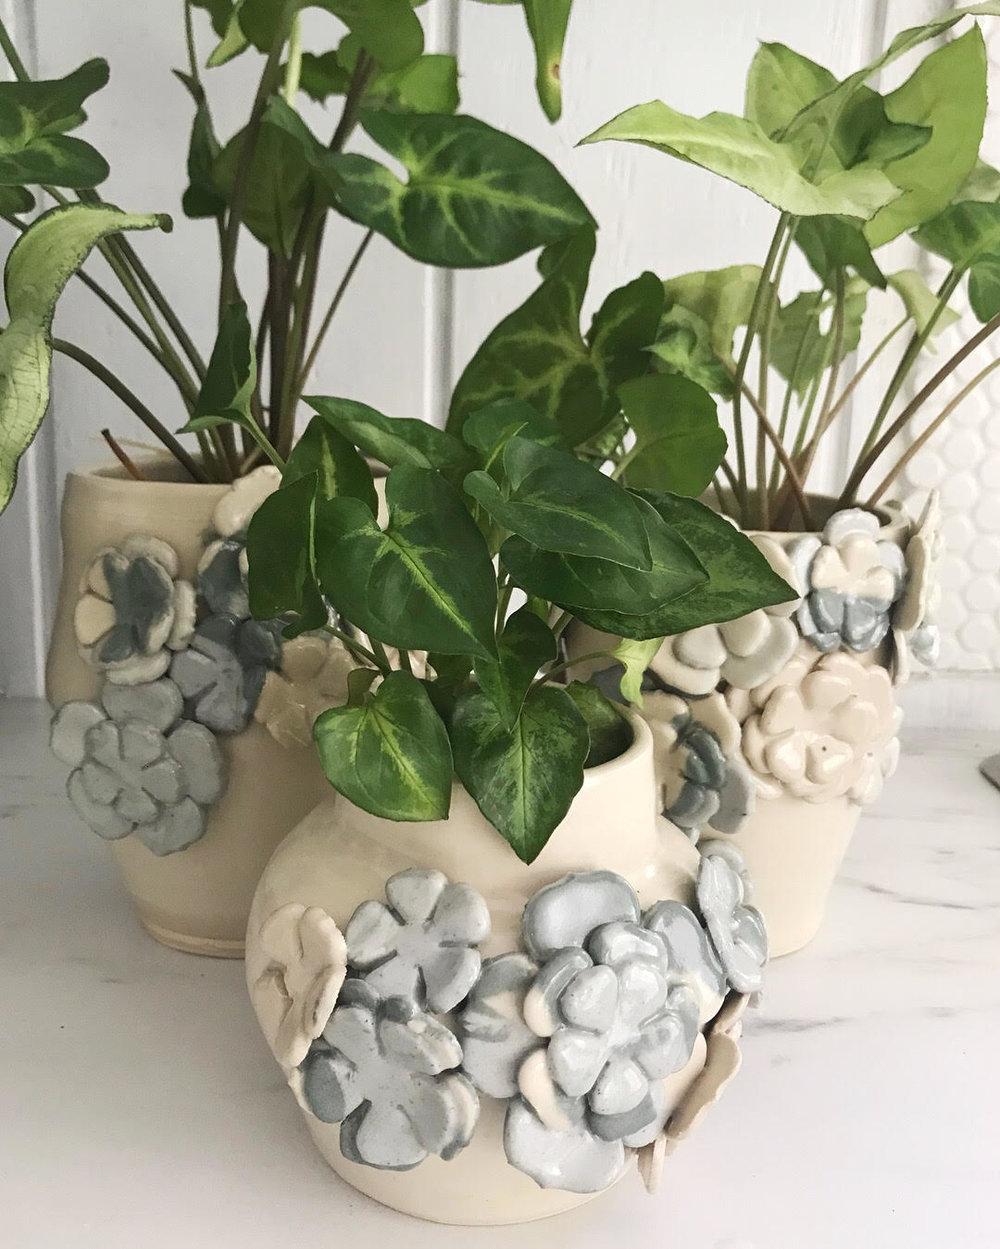 Flowered Jars with Plants.jpg